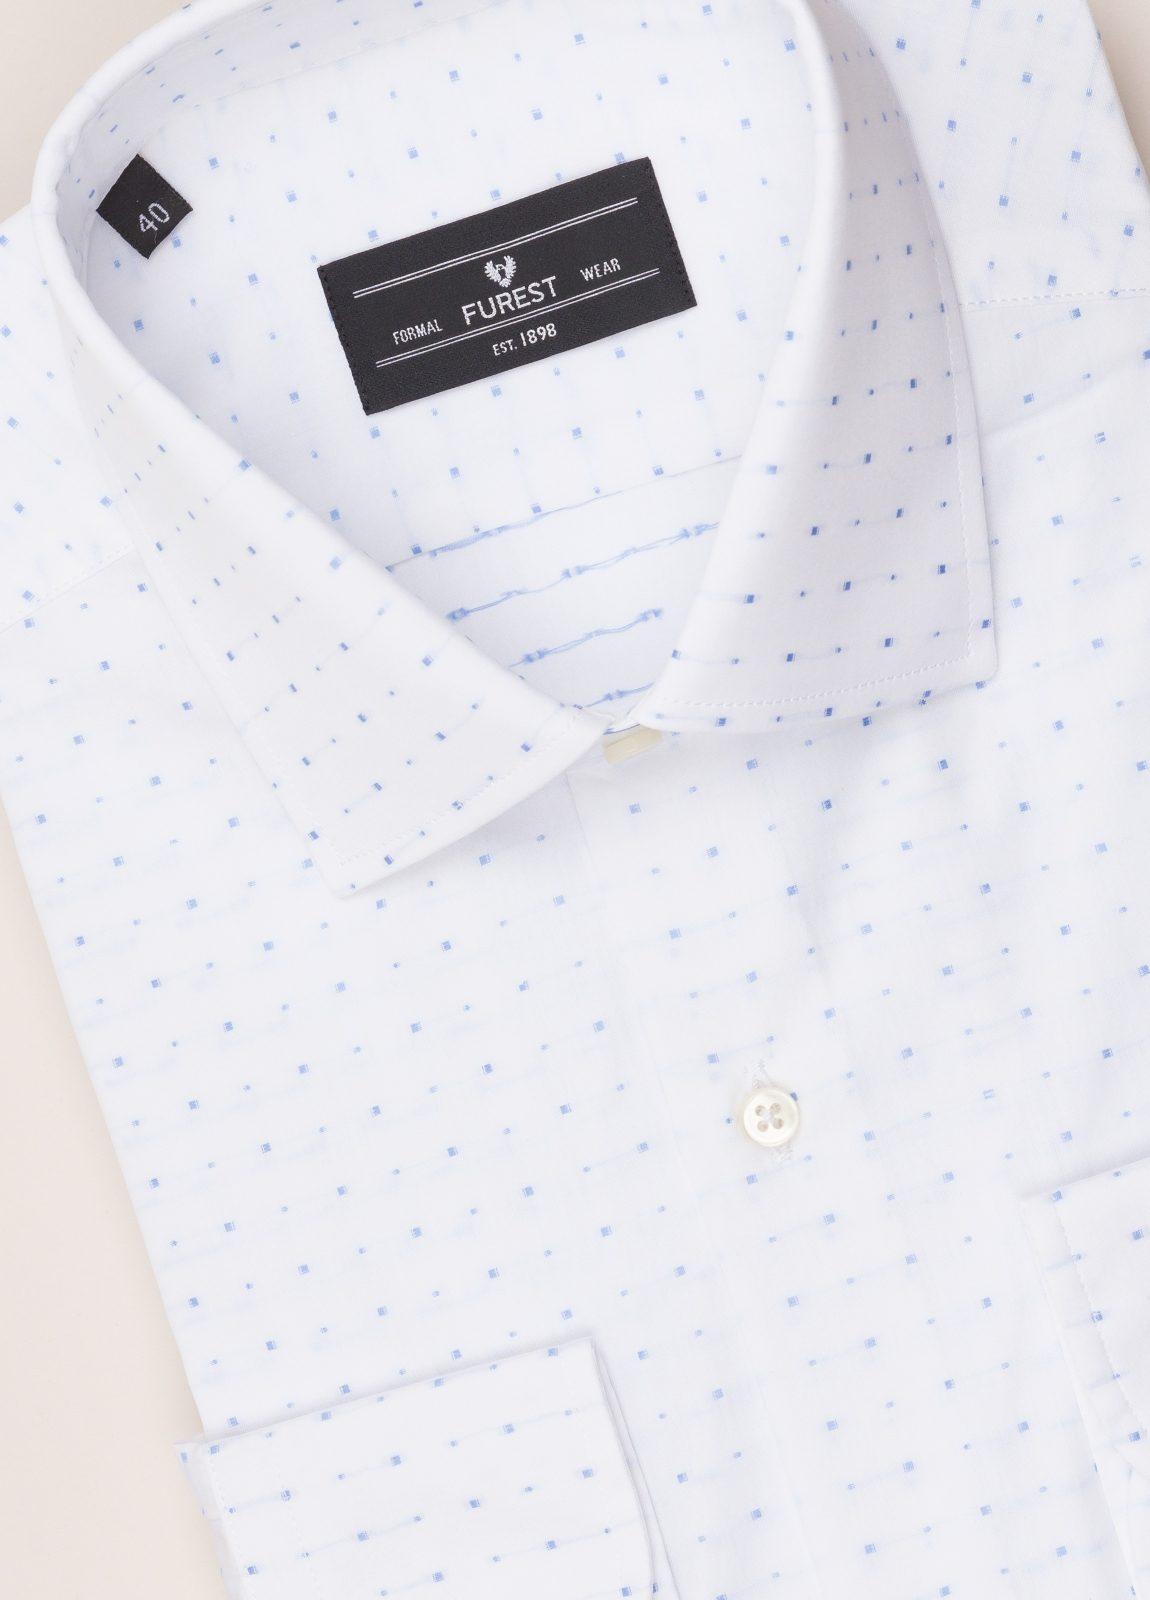 Camisa vestir FUREST COLECCIÓN SLIM FIT cuello italiano Fil Coupé dibujo geométrico - Ítem1